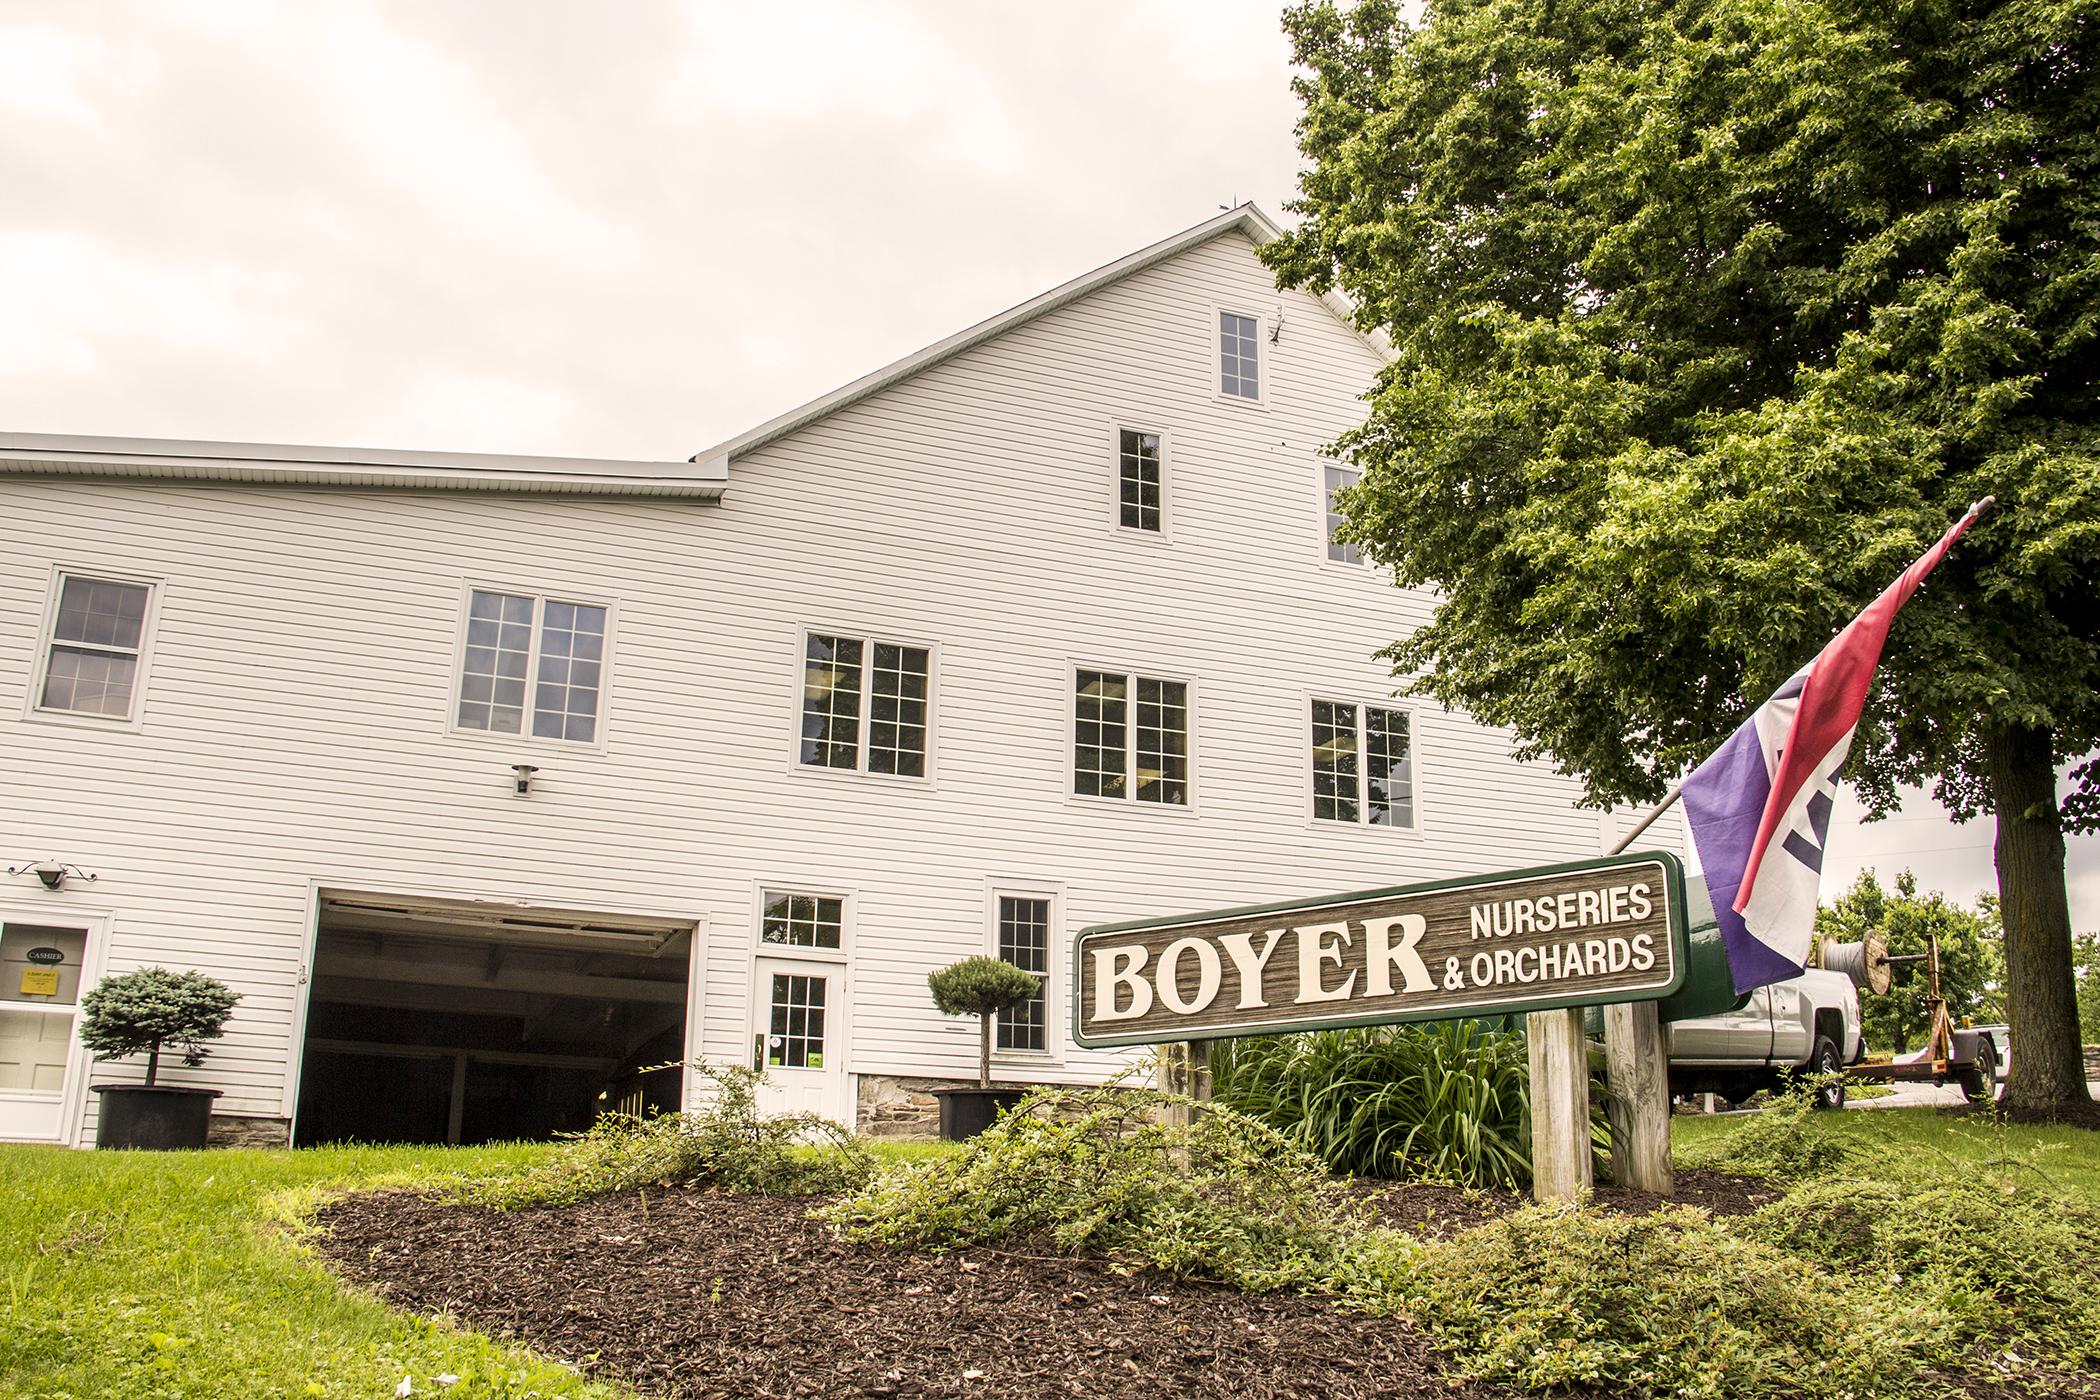 Boyer Nurseries Orchards